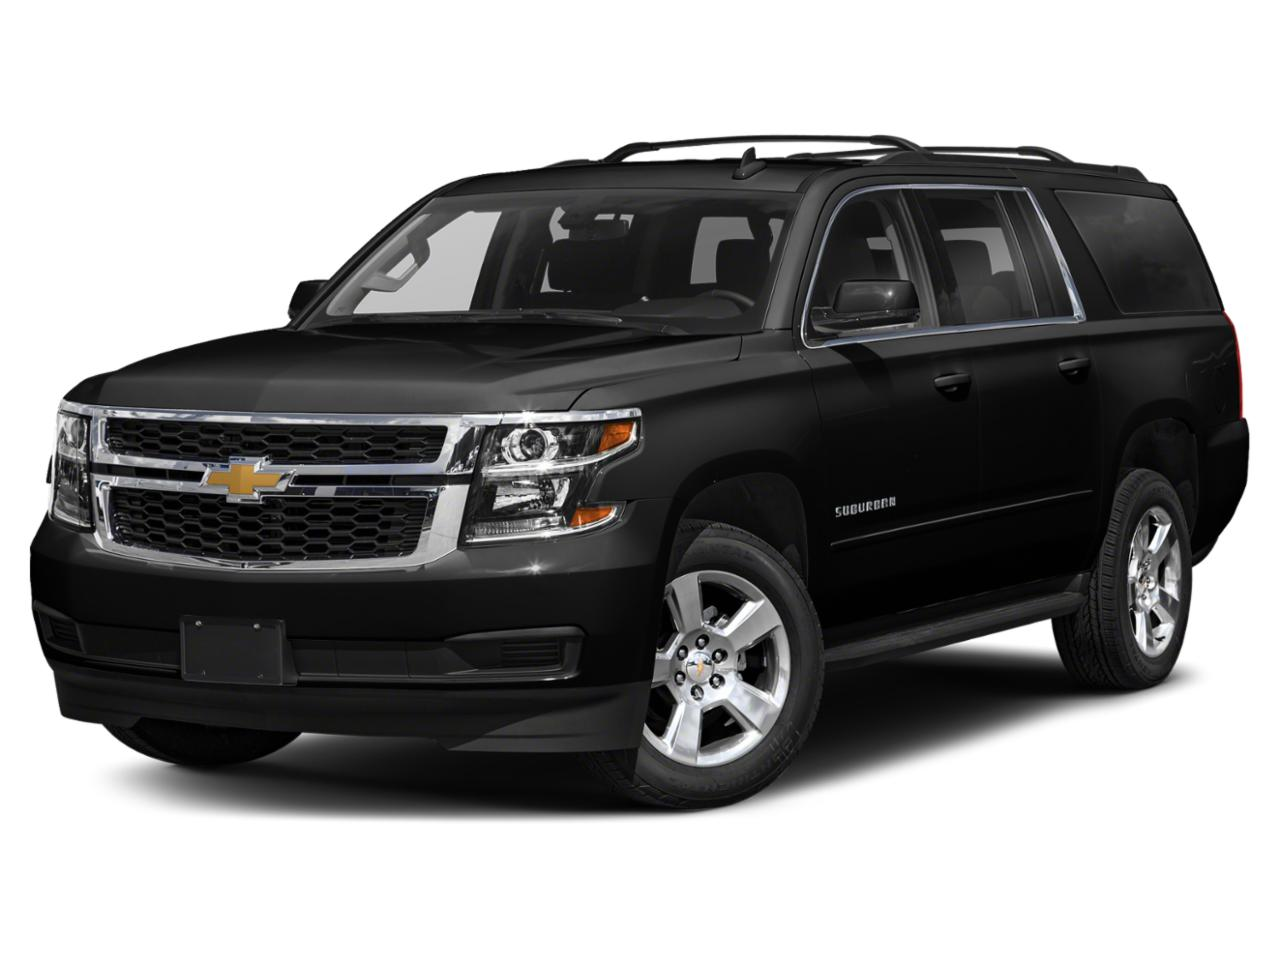 2018 Chevrolet Suburban Vehicle Photo in Lawrenceville, NJ 08648